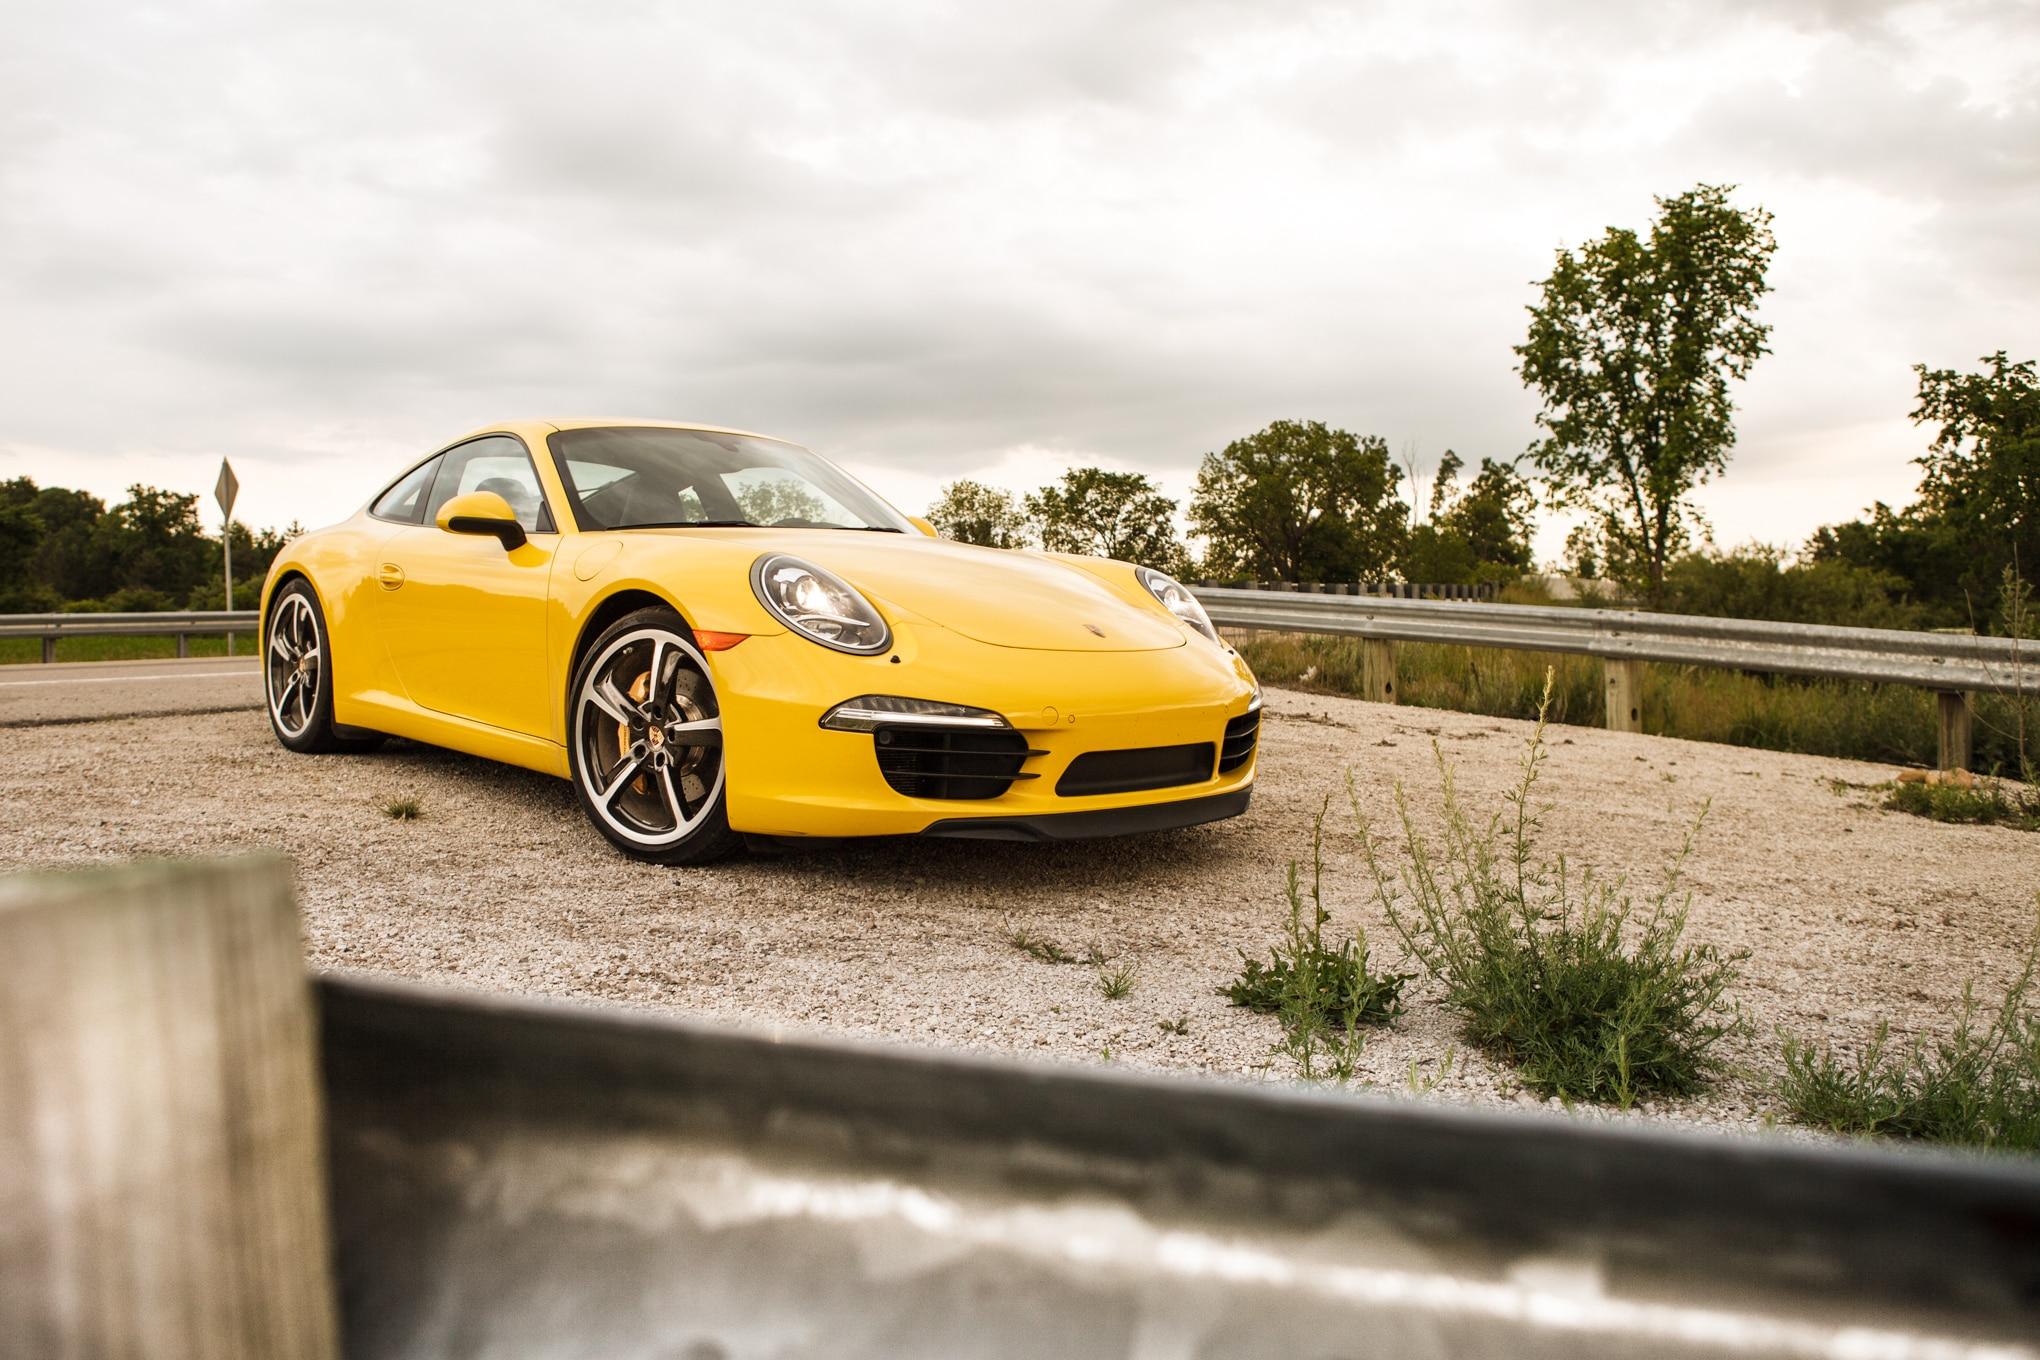 2013 Porsche 911 Carrera S Front Right View 11